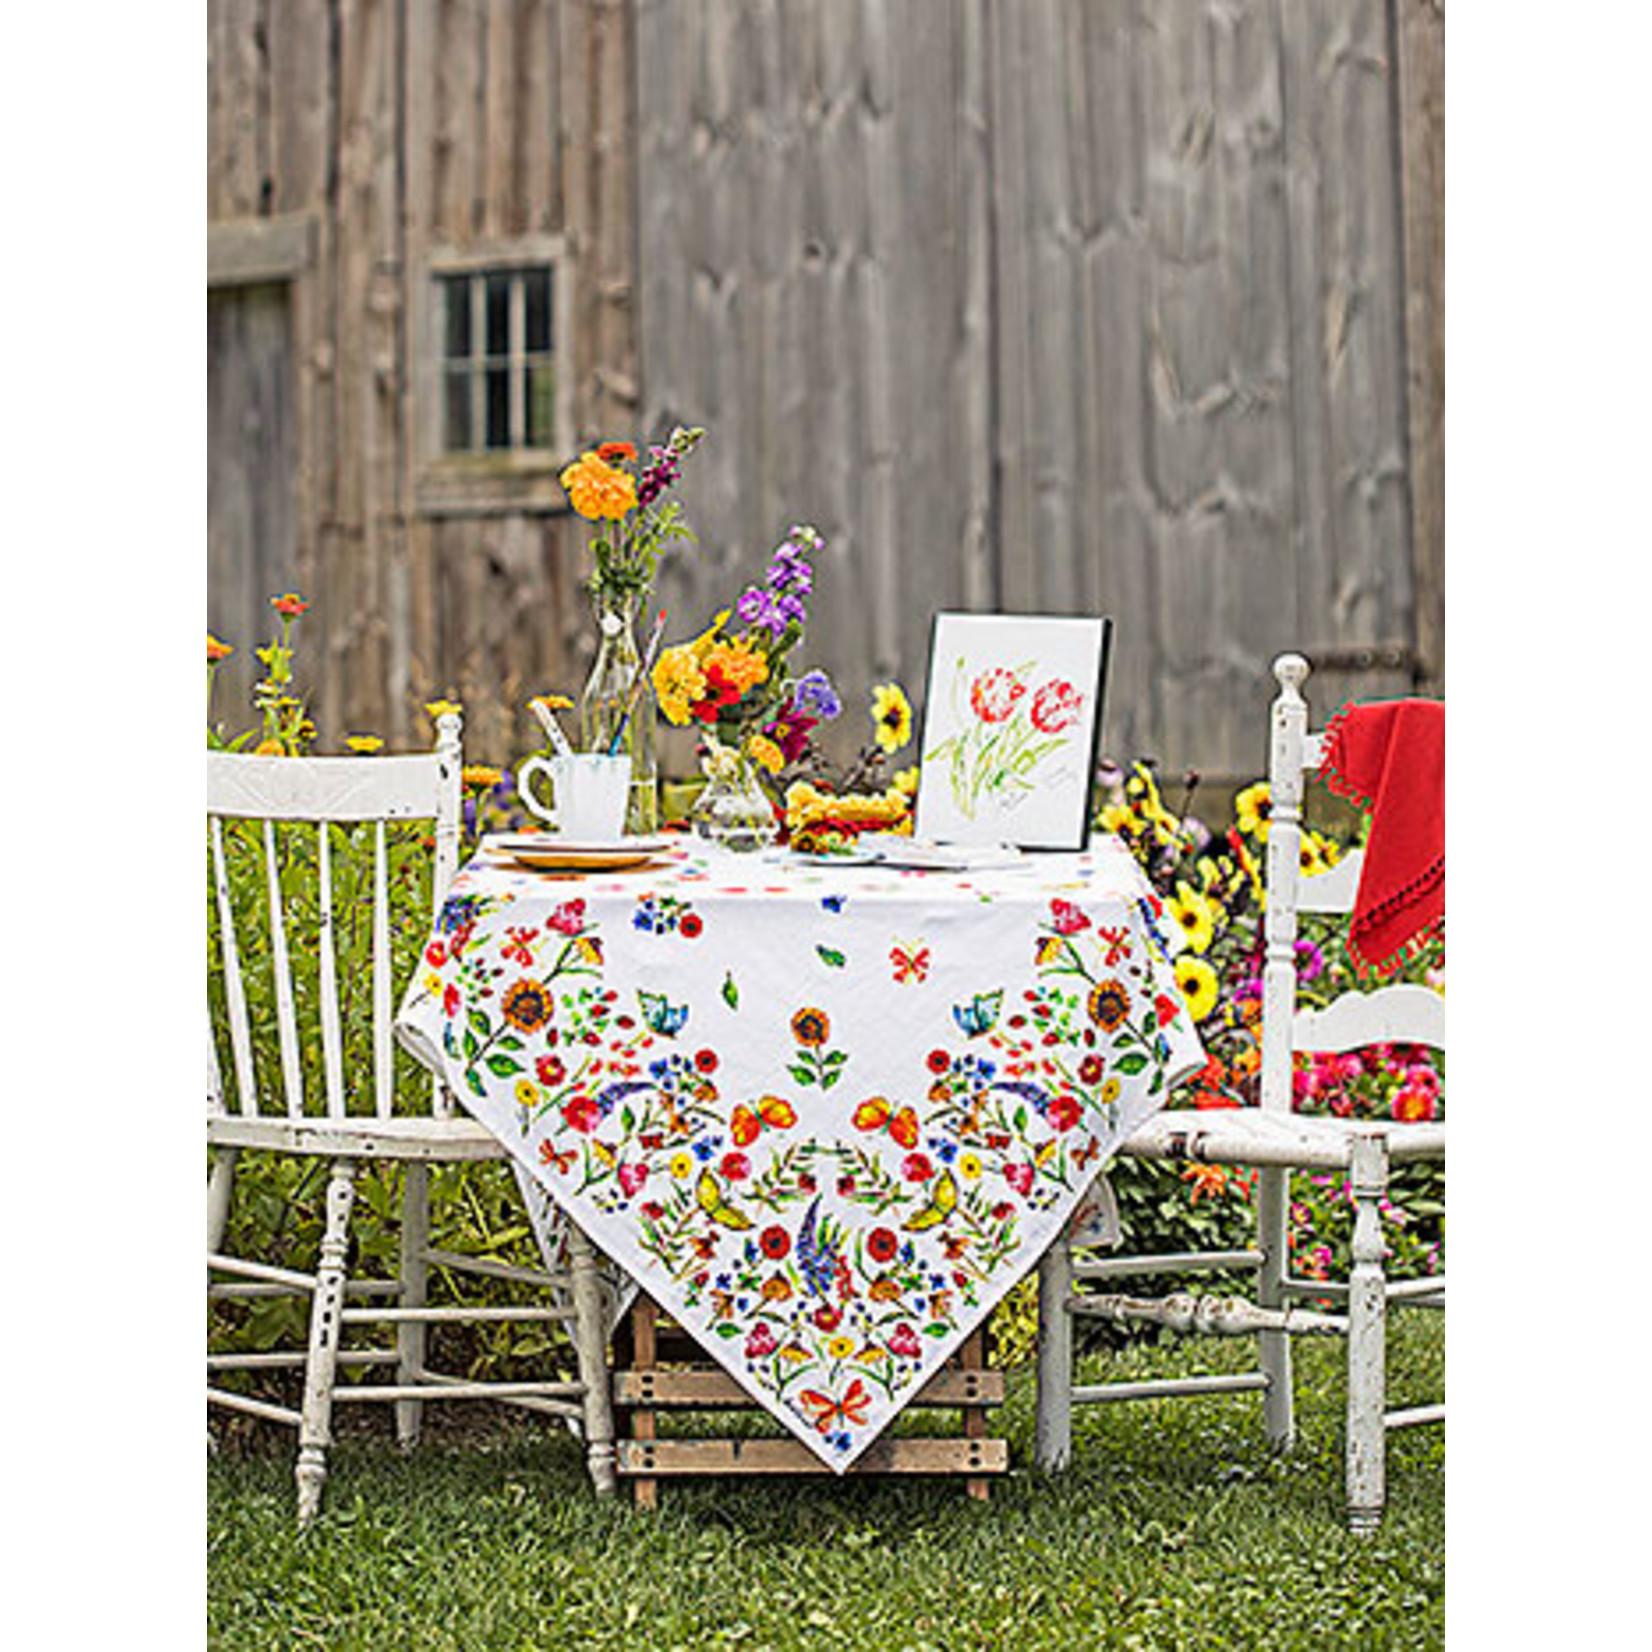 April Cornell Sister Garden 54x54 Tablecloth